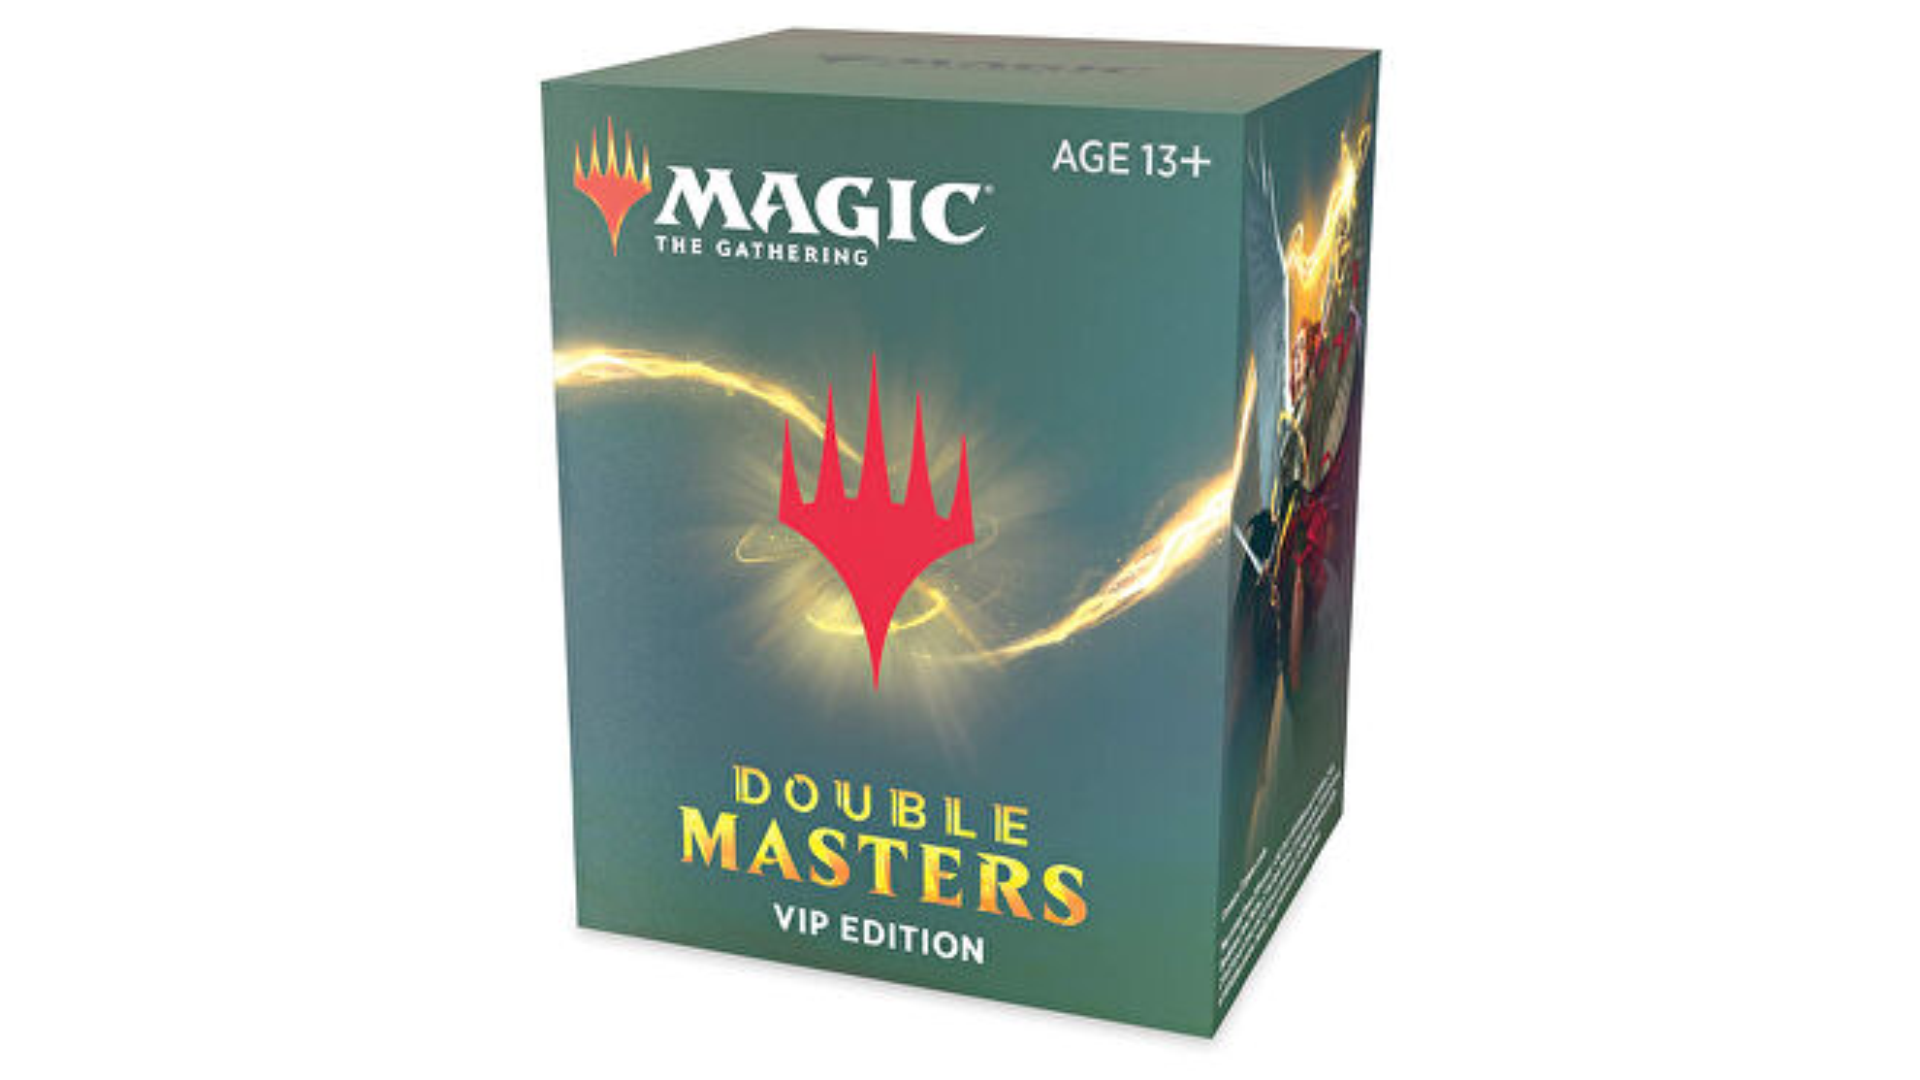 mtg-double-masters-vip-edition.jpg